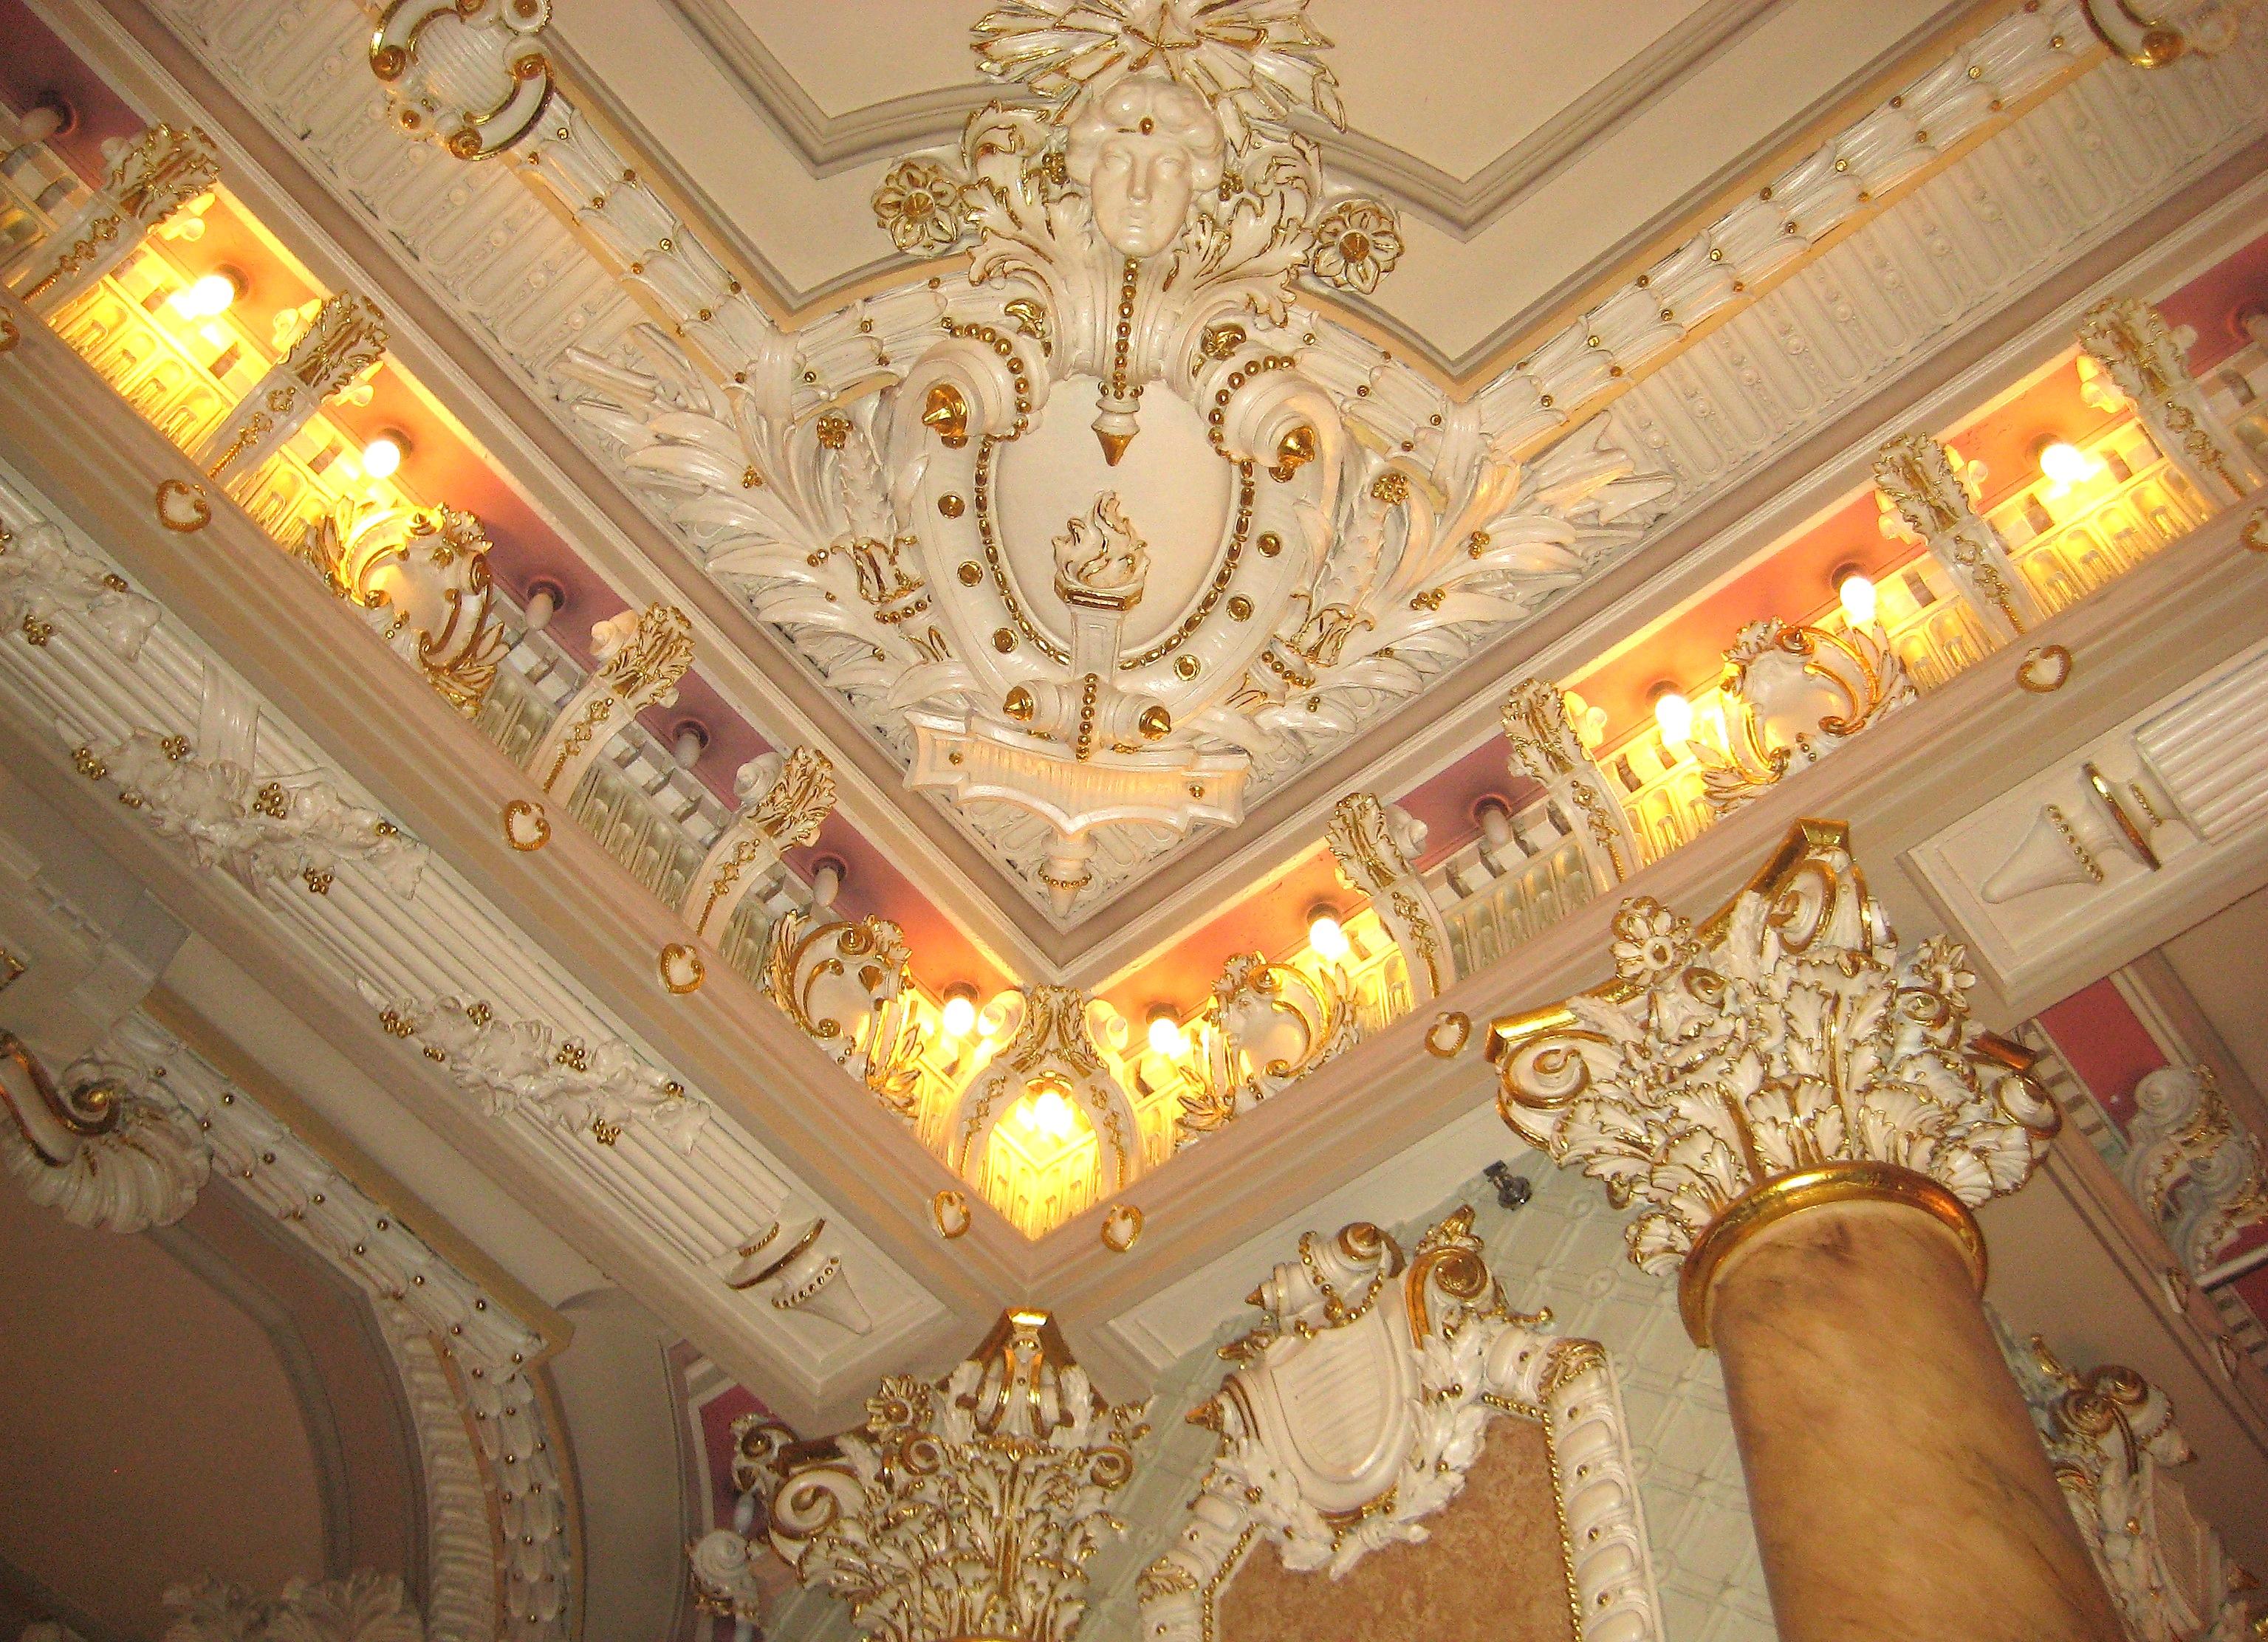 The wildly ornate lobby inside a budget hotel | Ephemeral